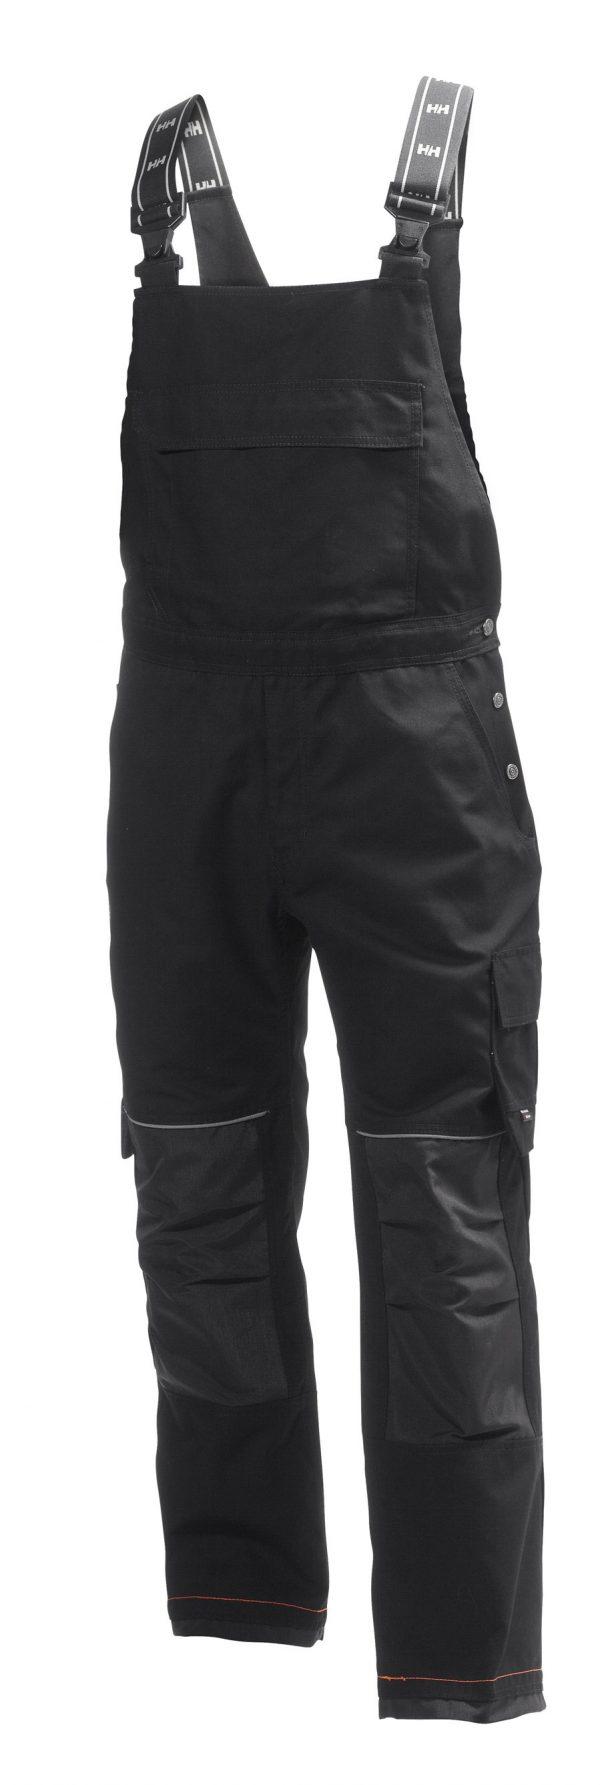 76541 Helly Hansen Workwear Men's Chelsea Construction Bib Pant w/ Cordura® Reinforcement, Hammer Holster & Hanging Pockets, Black Front